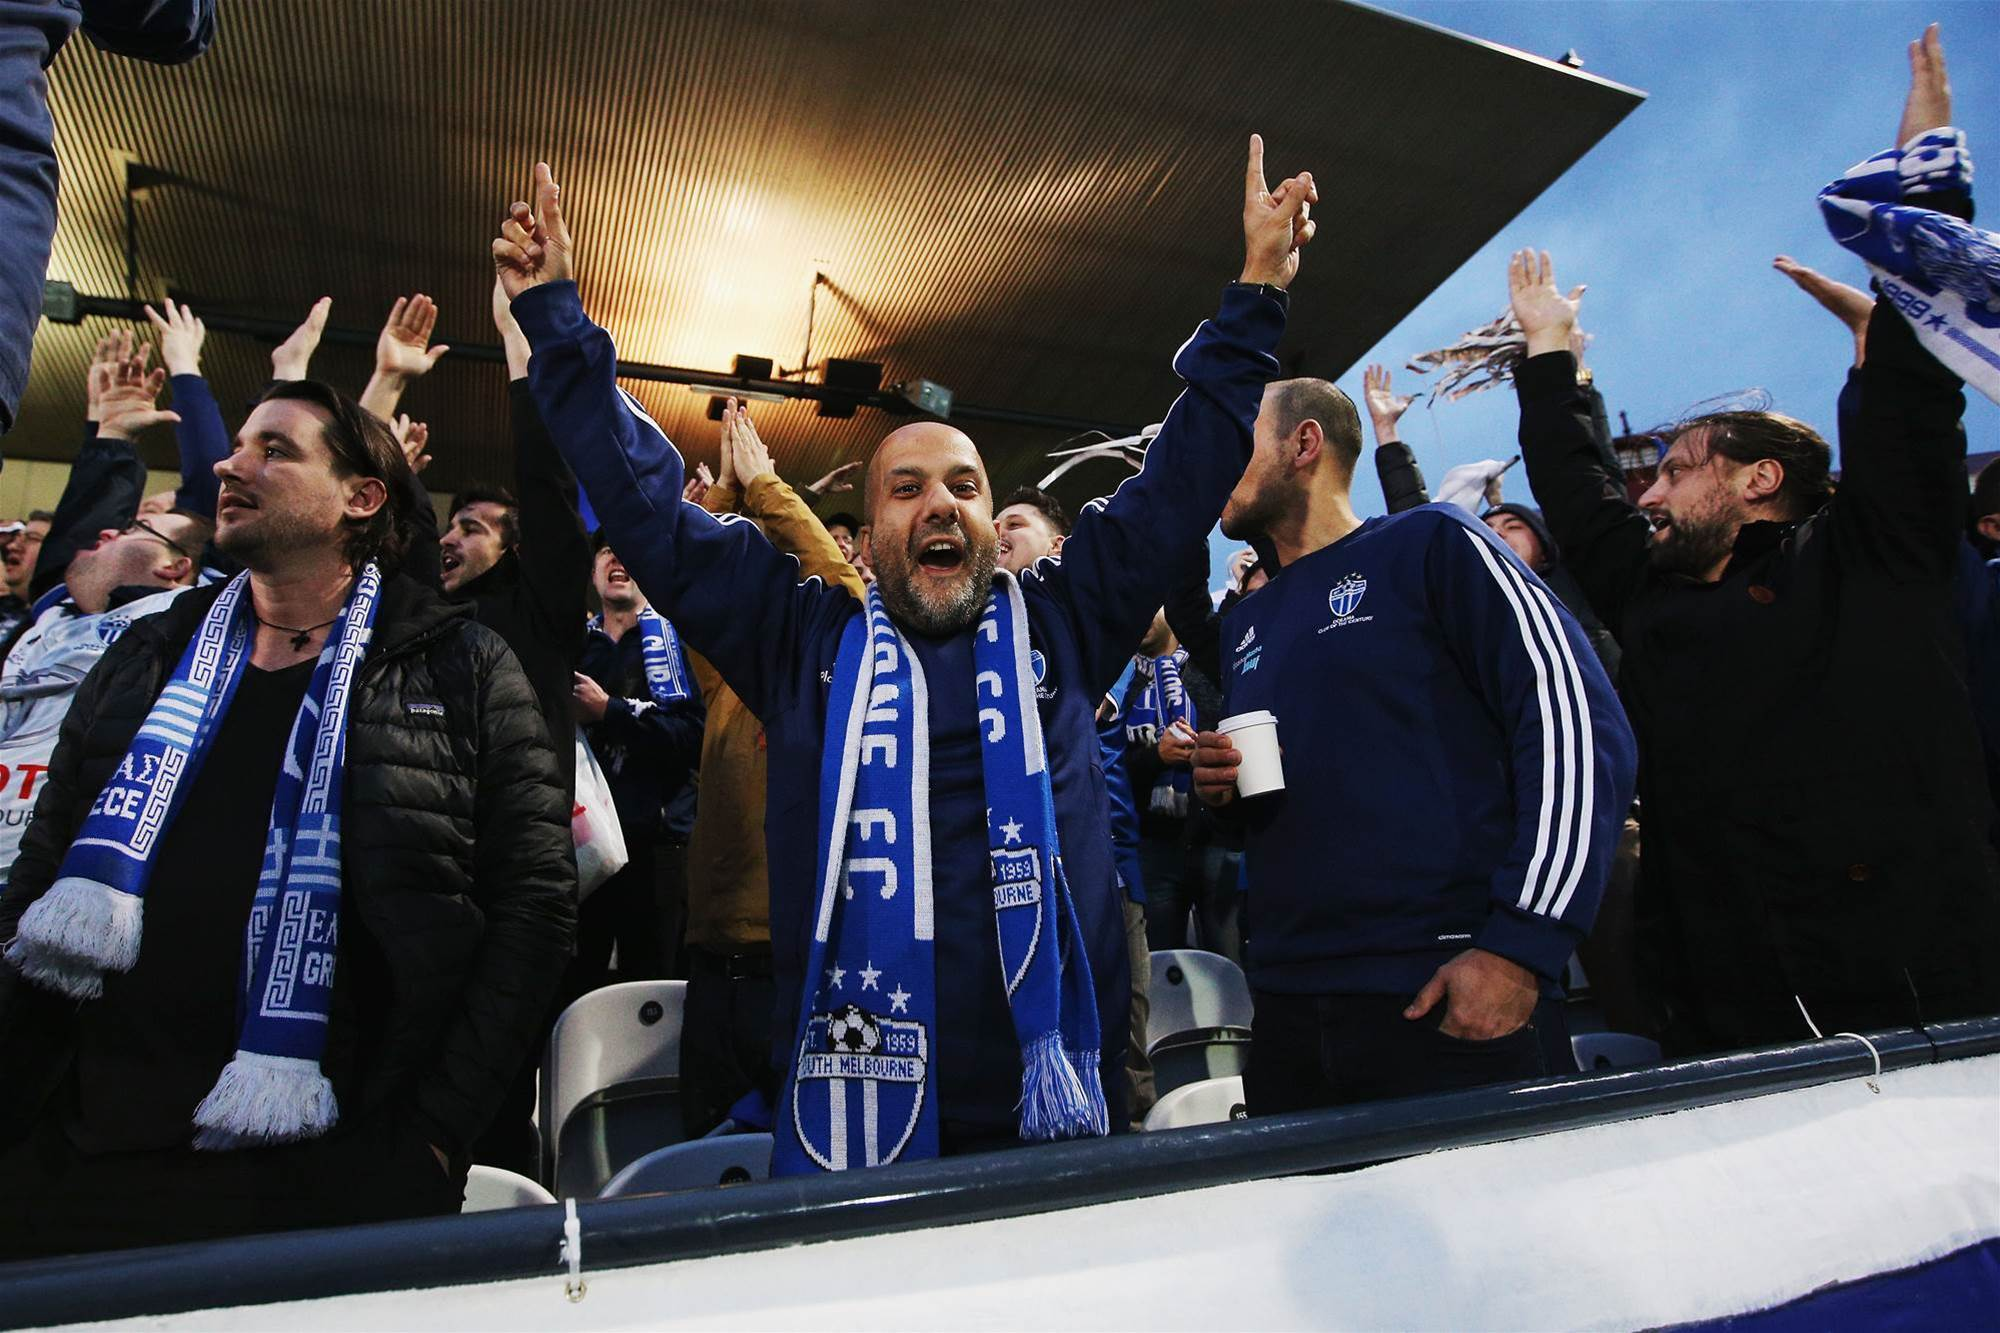 FFA Cup semi-final pic special